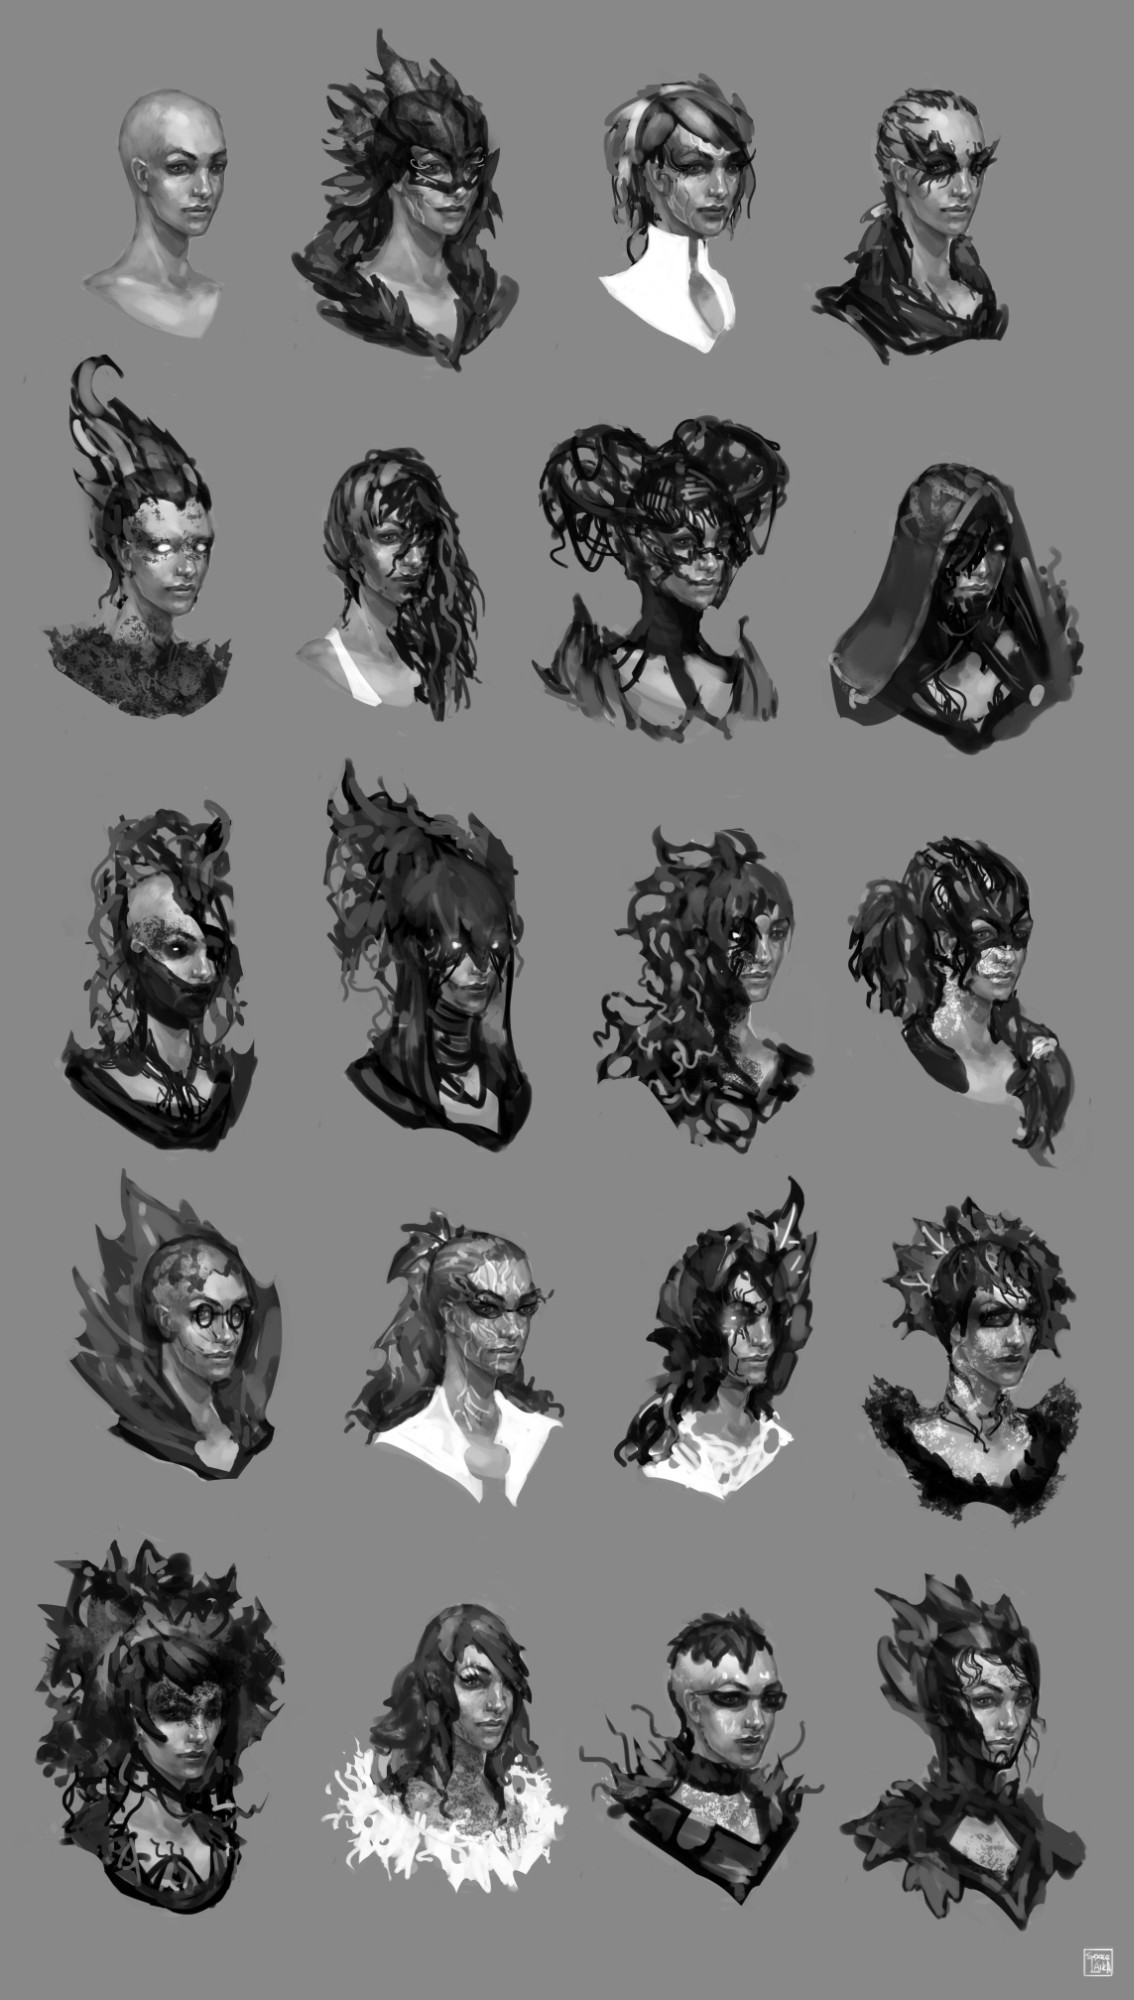 anna-orlova-poison-ivy-head-studies-by-spacelaika-d6tviwx.jpg